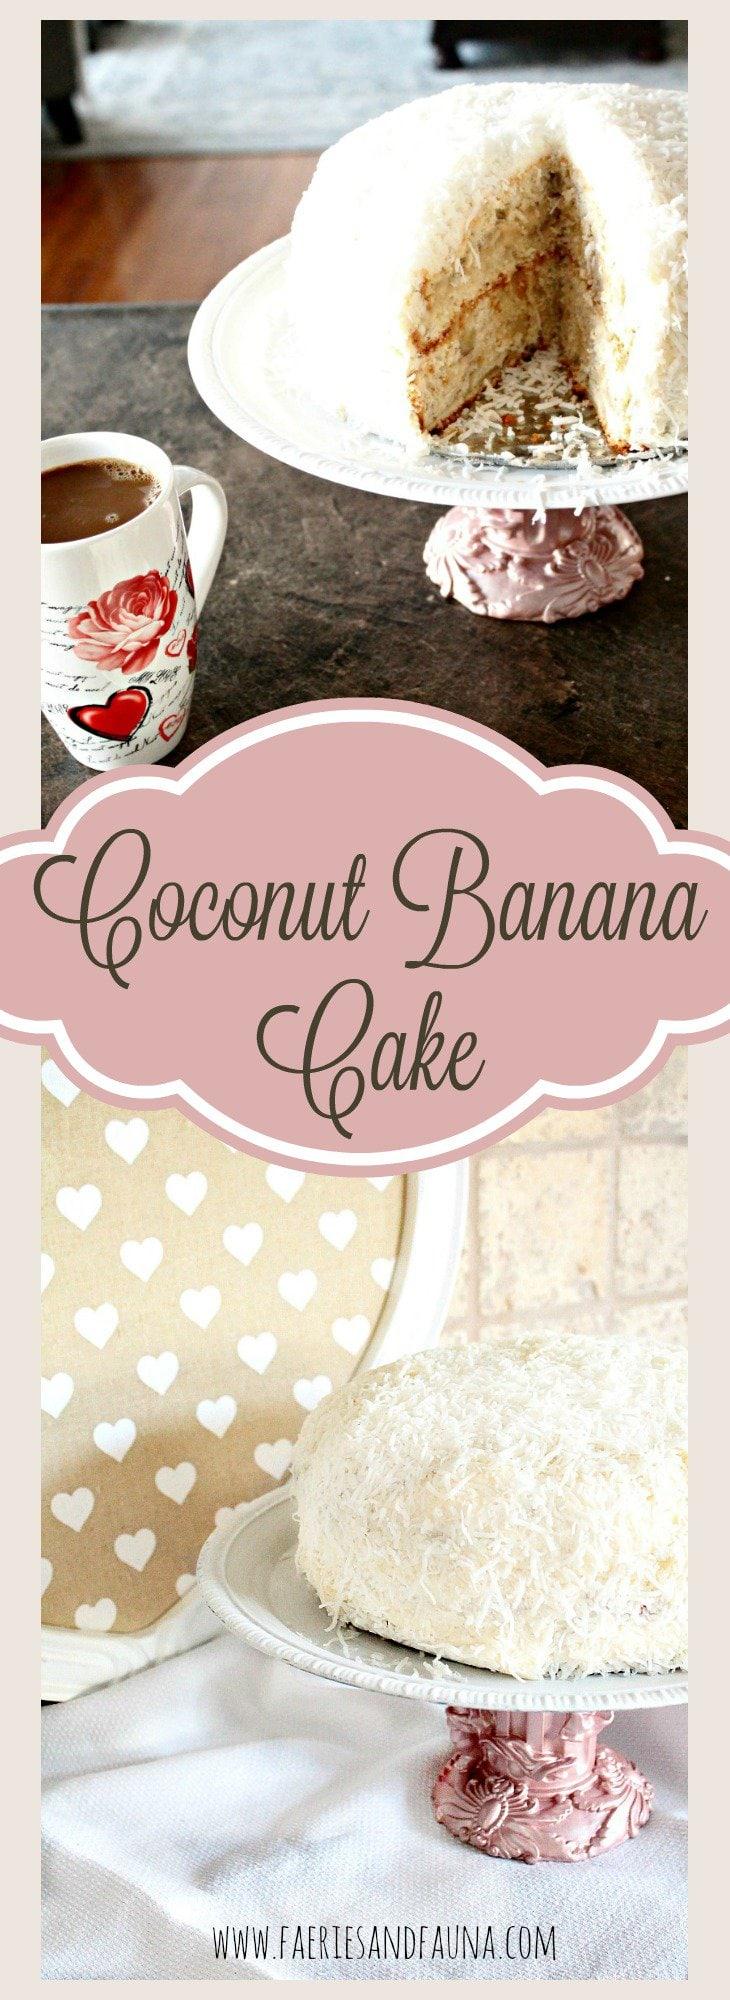 baking recipe, cake recipe